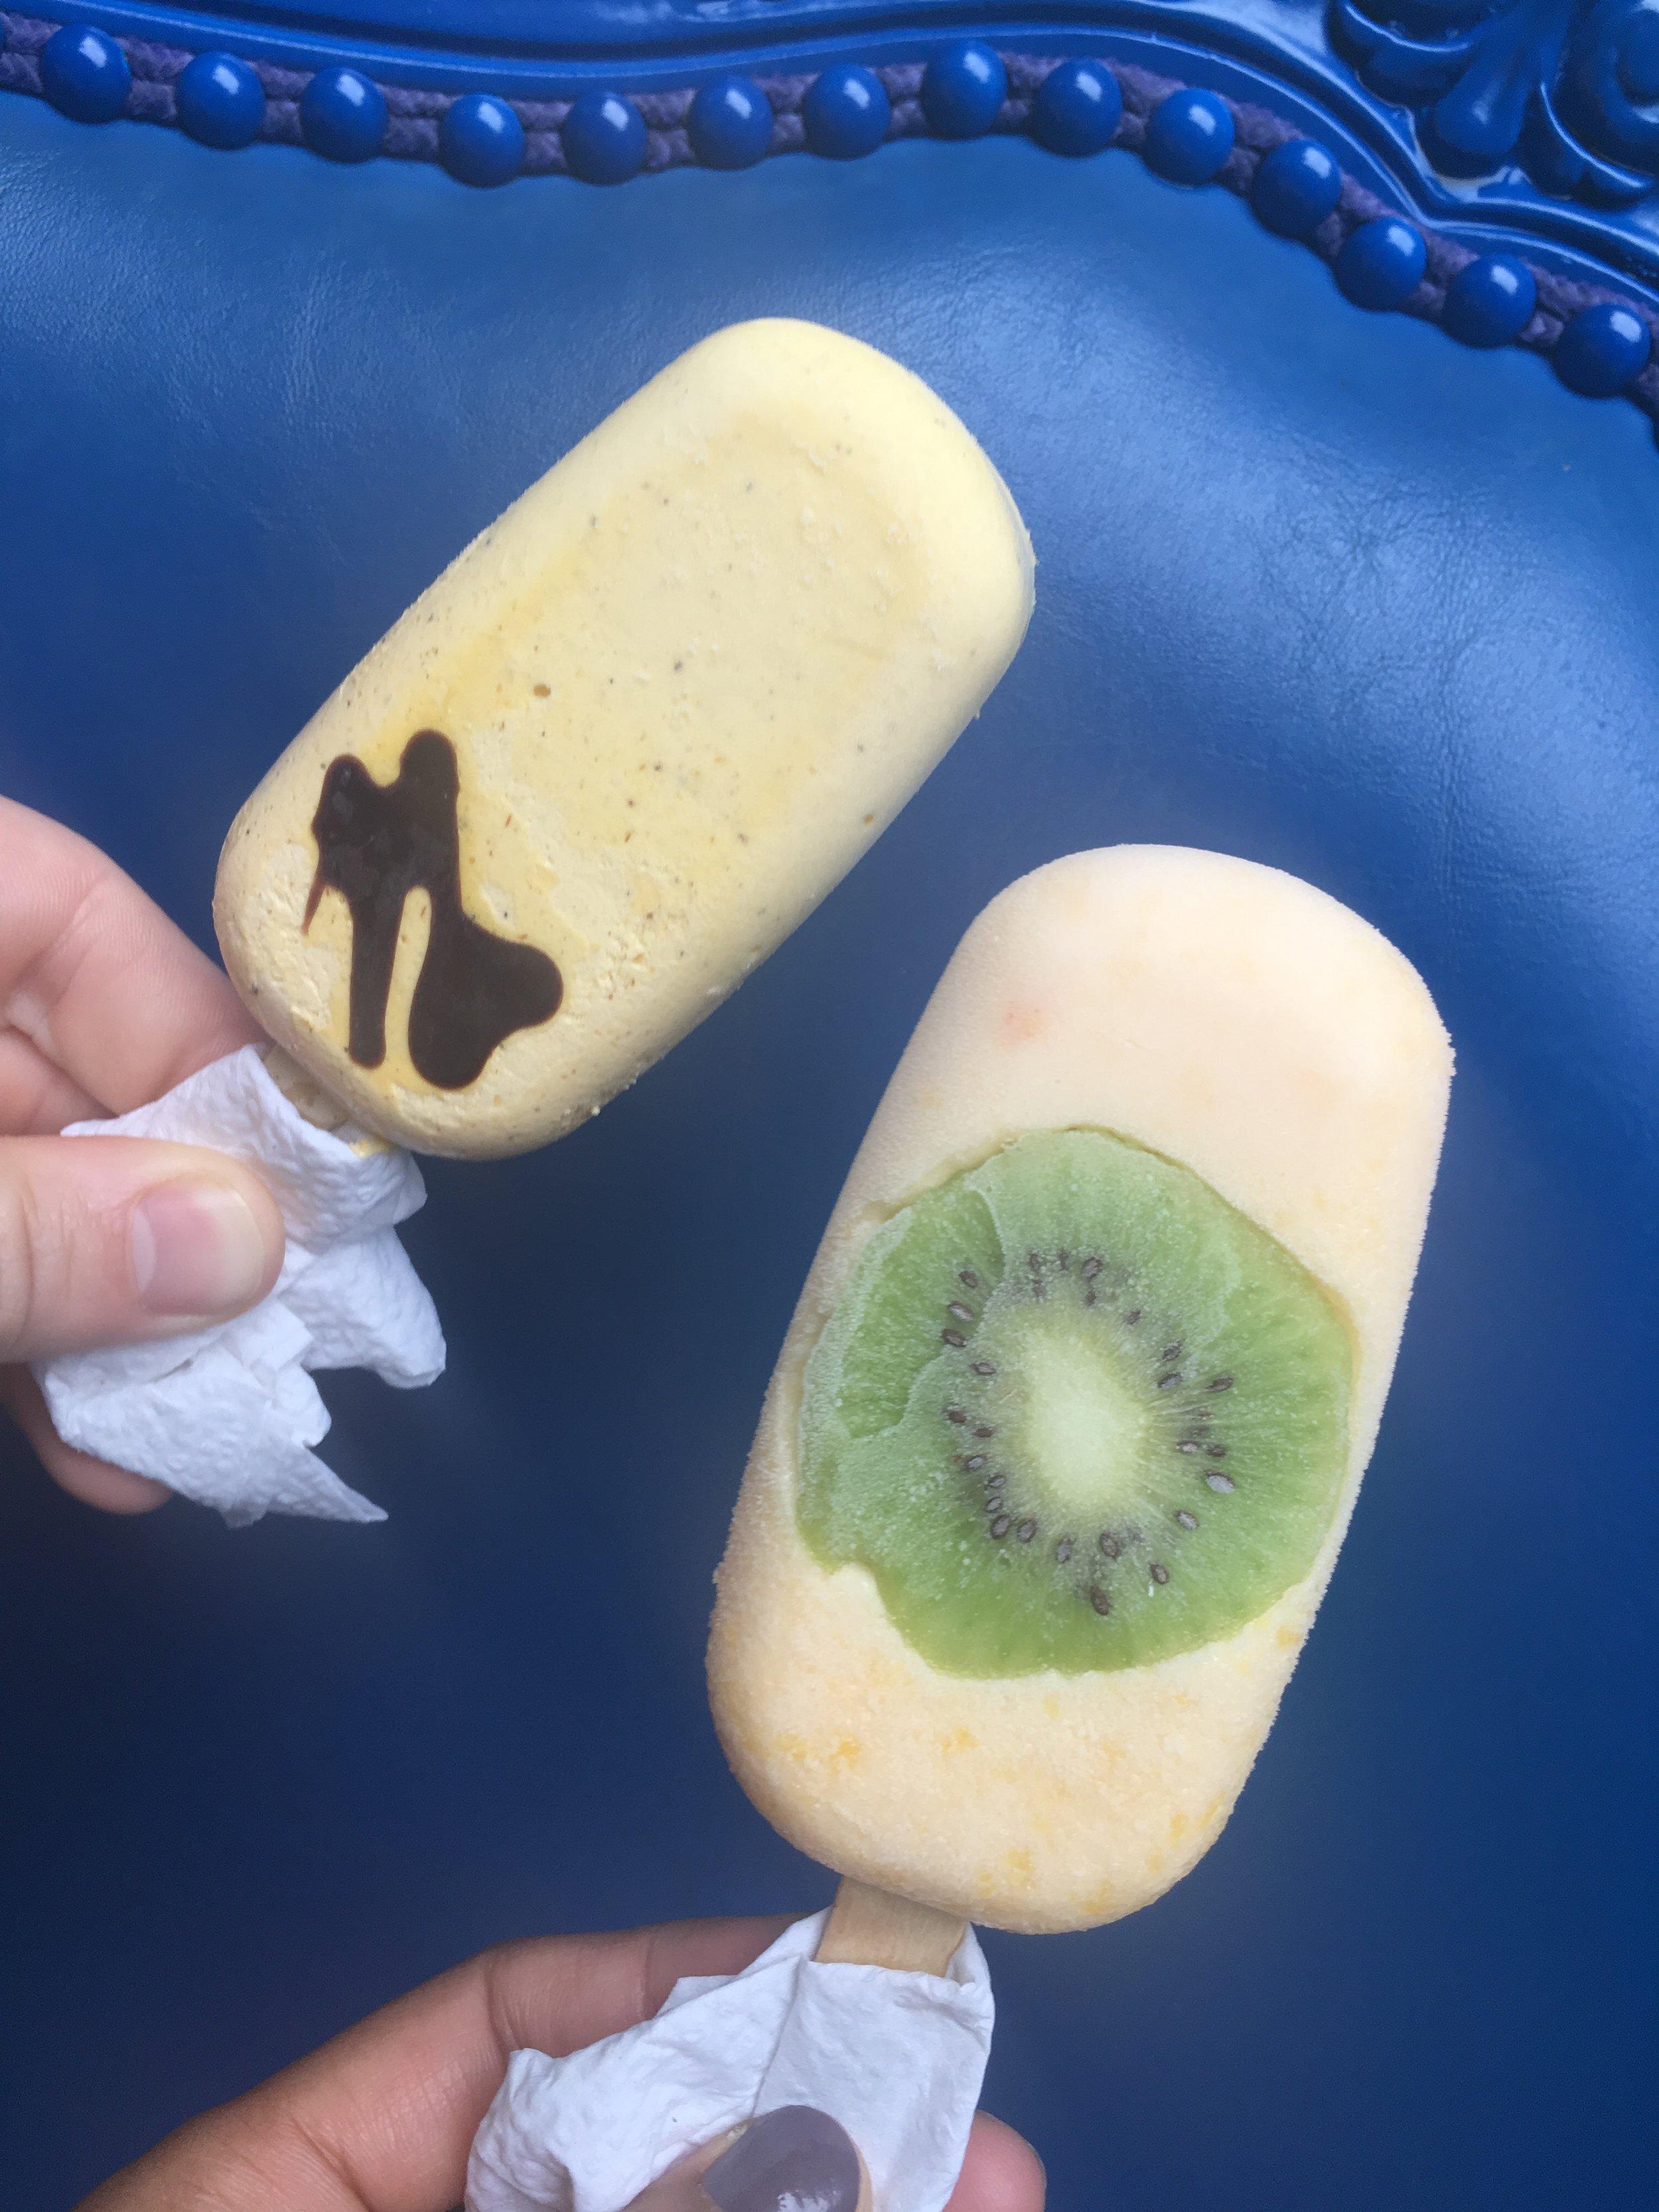 playa-del-carmen-food-5.JPG